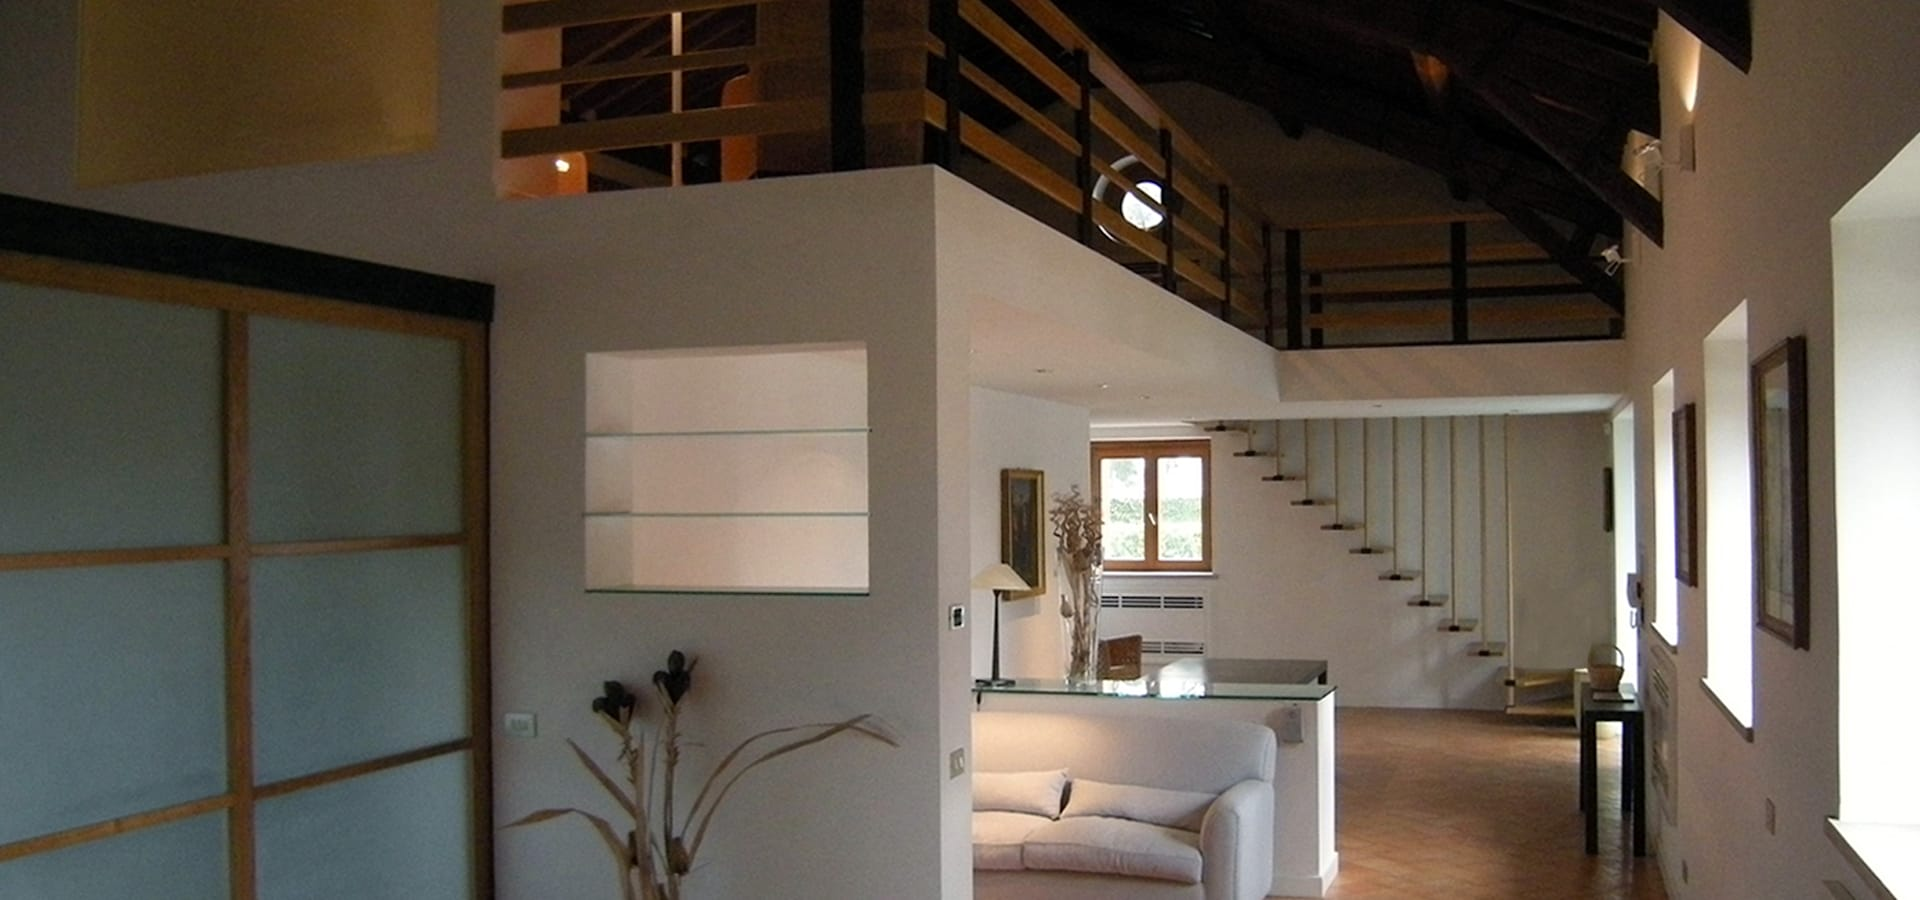 Studio Racheli Architetti